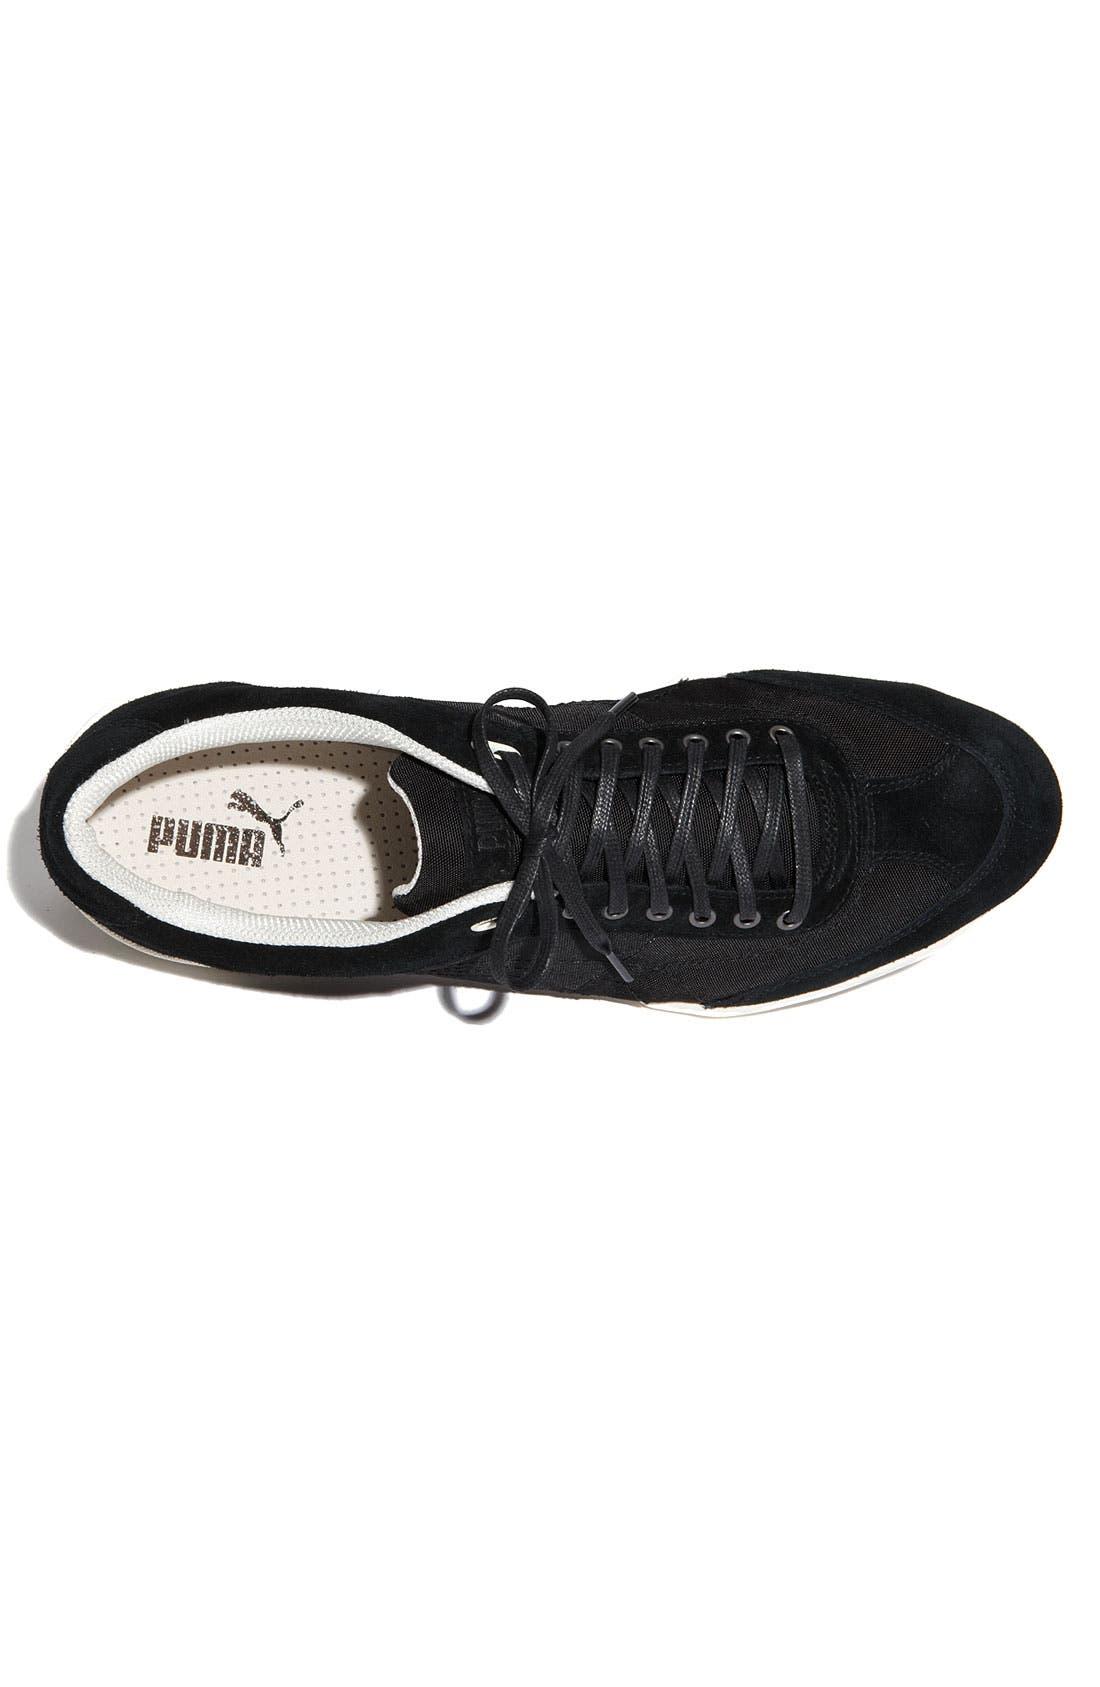 'Blackstation Standpunkt' Sneaker,                             Alternate thumbnail 2, color,                             001